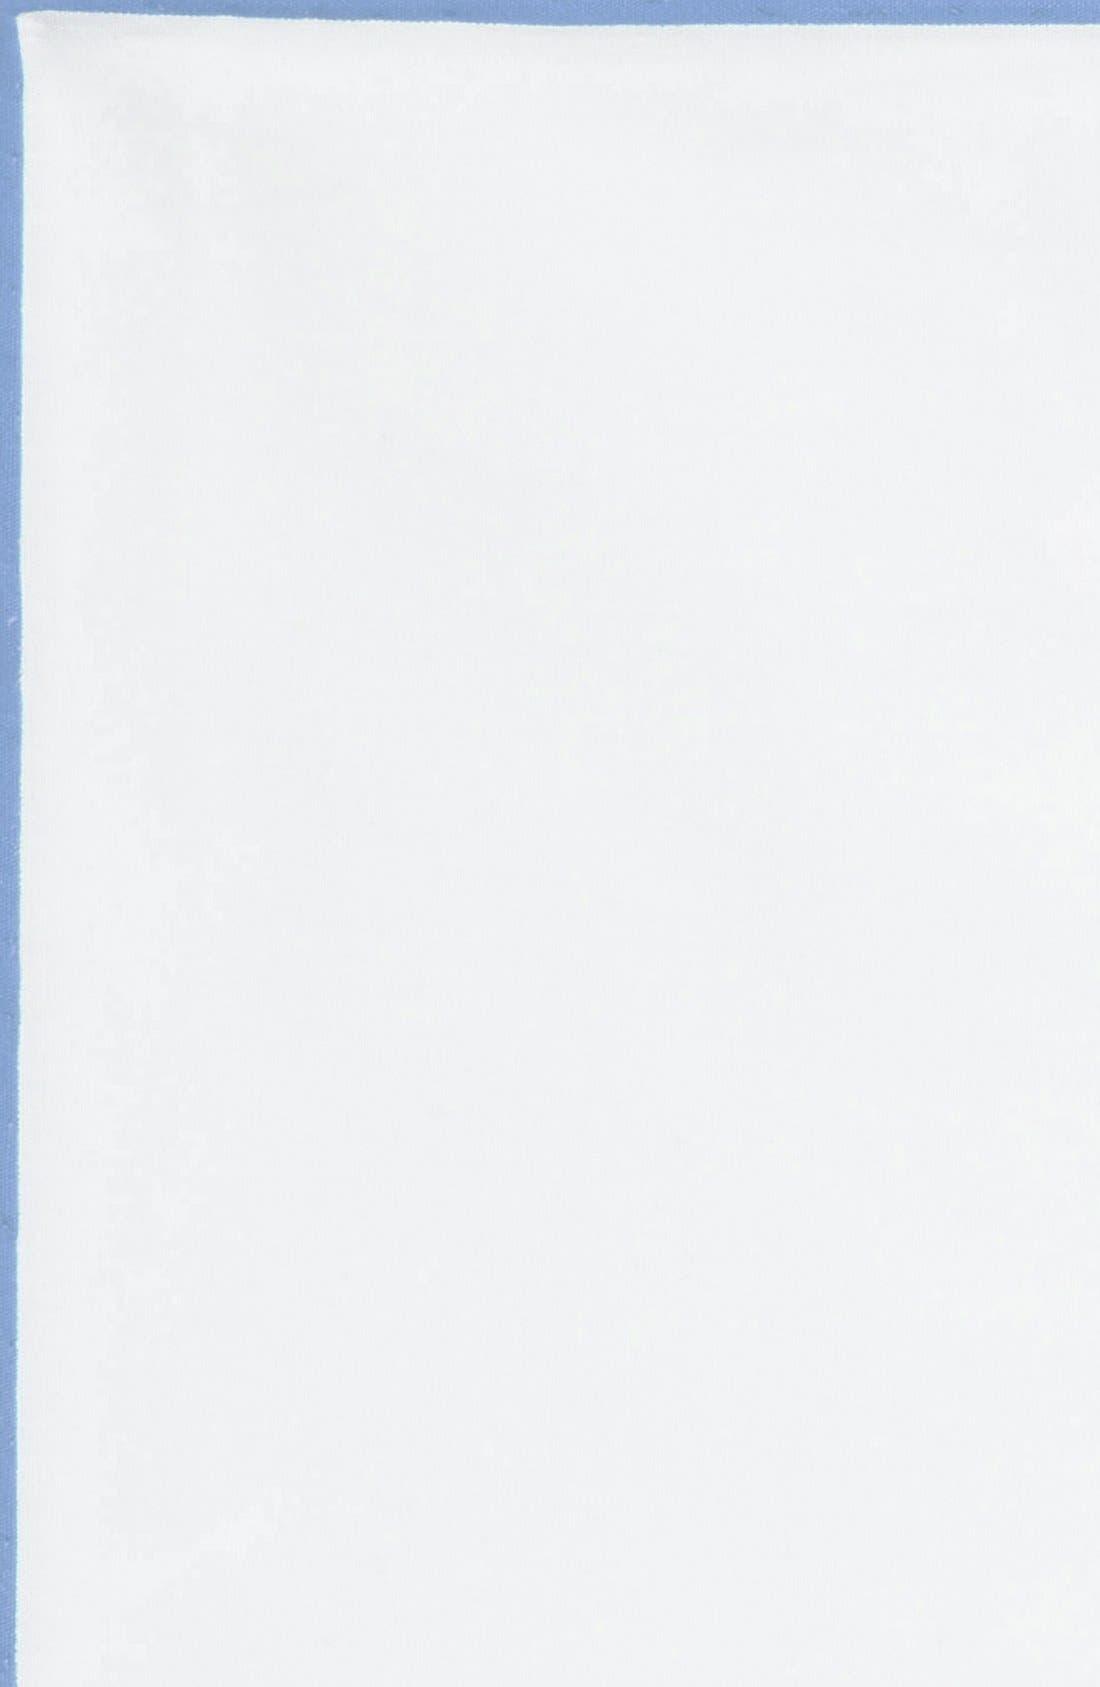 Cotton Solid Pocket Square,                             Alternate thumbnail 2, color,                             White/ Light Blue